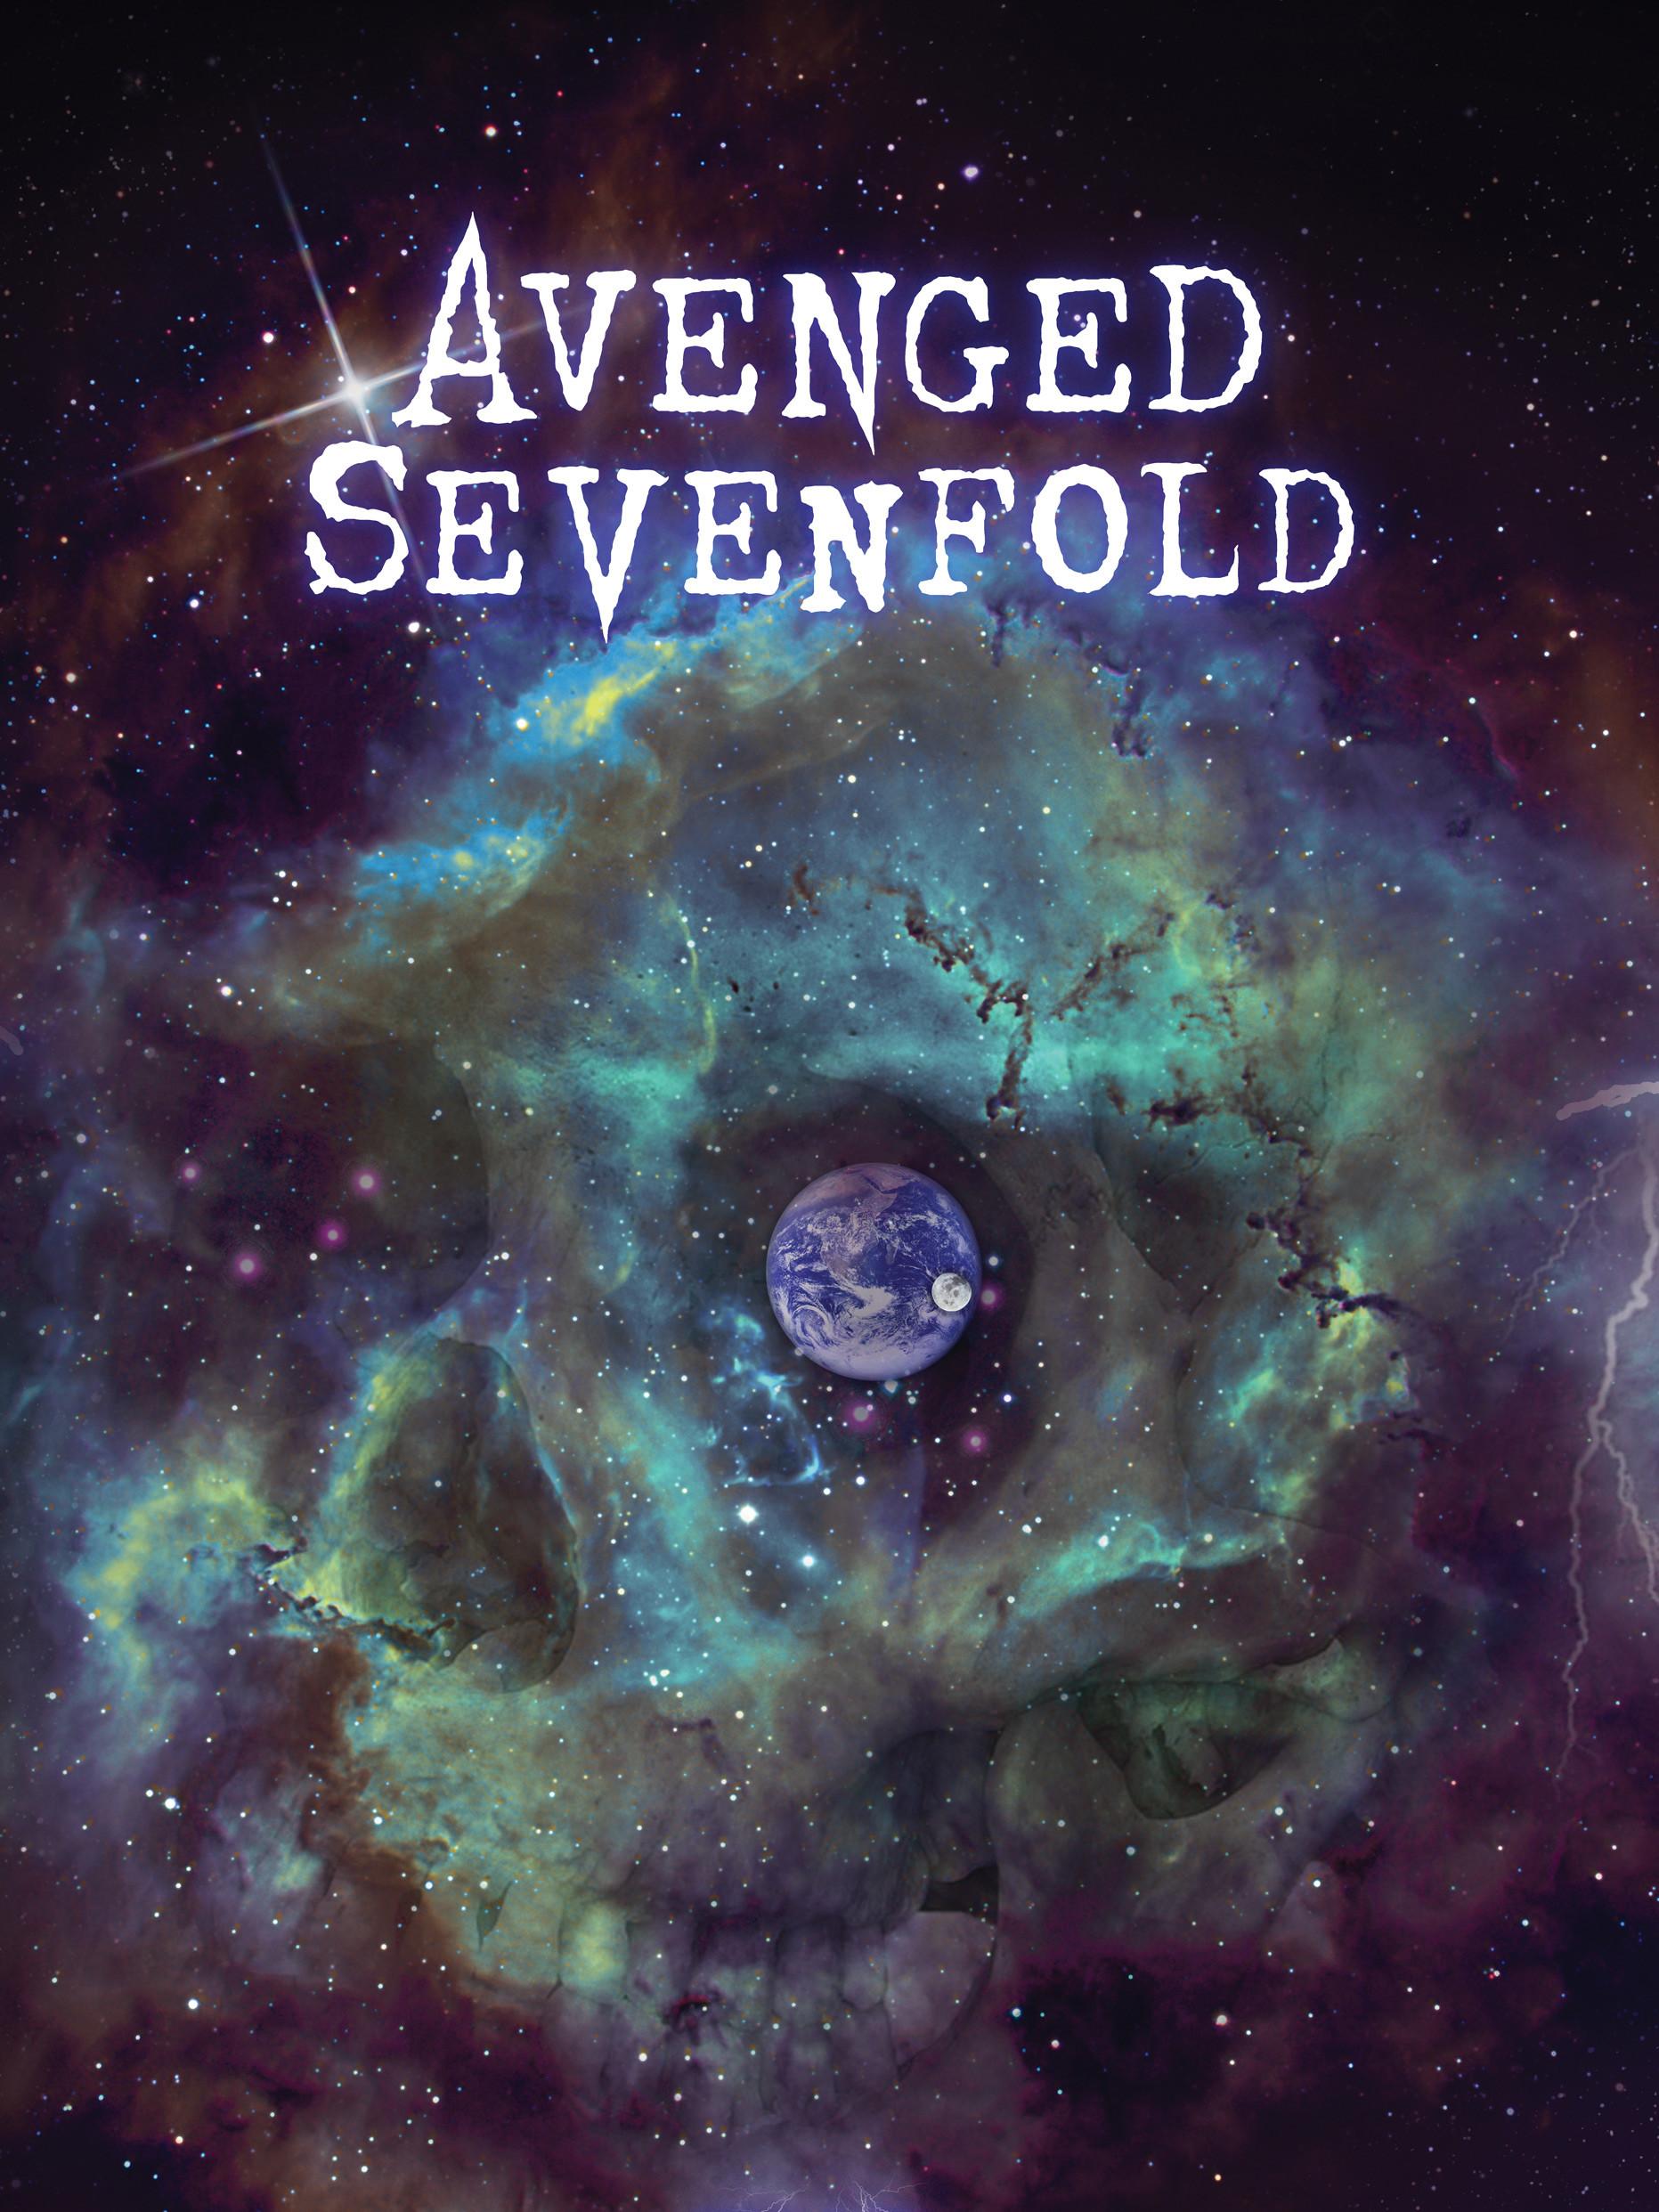 Avenged Sevenfold iPhone Wallpaper 1863×2484